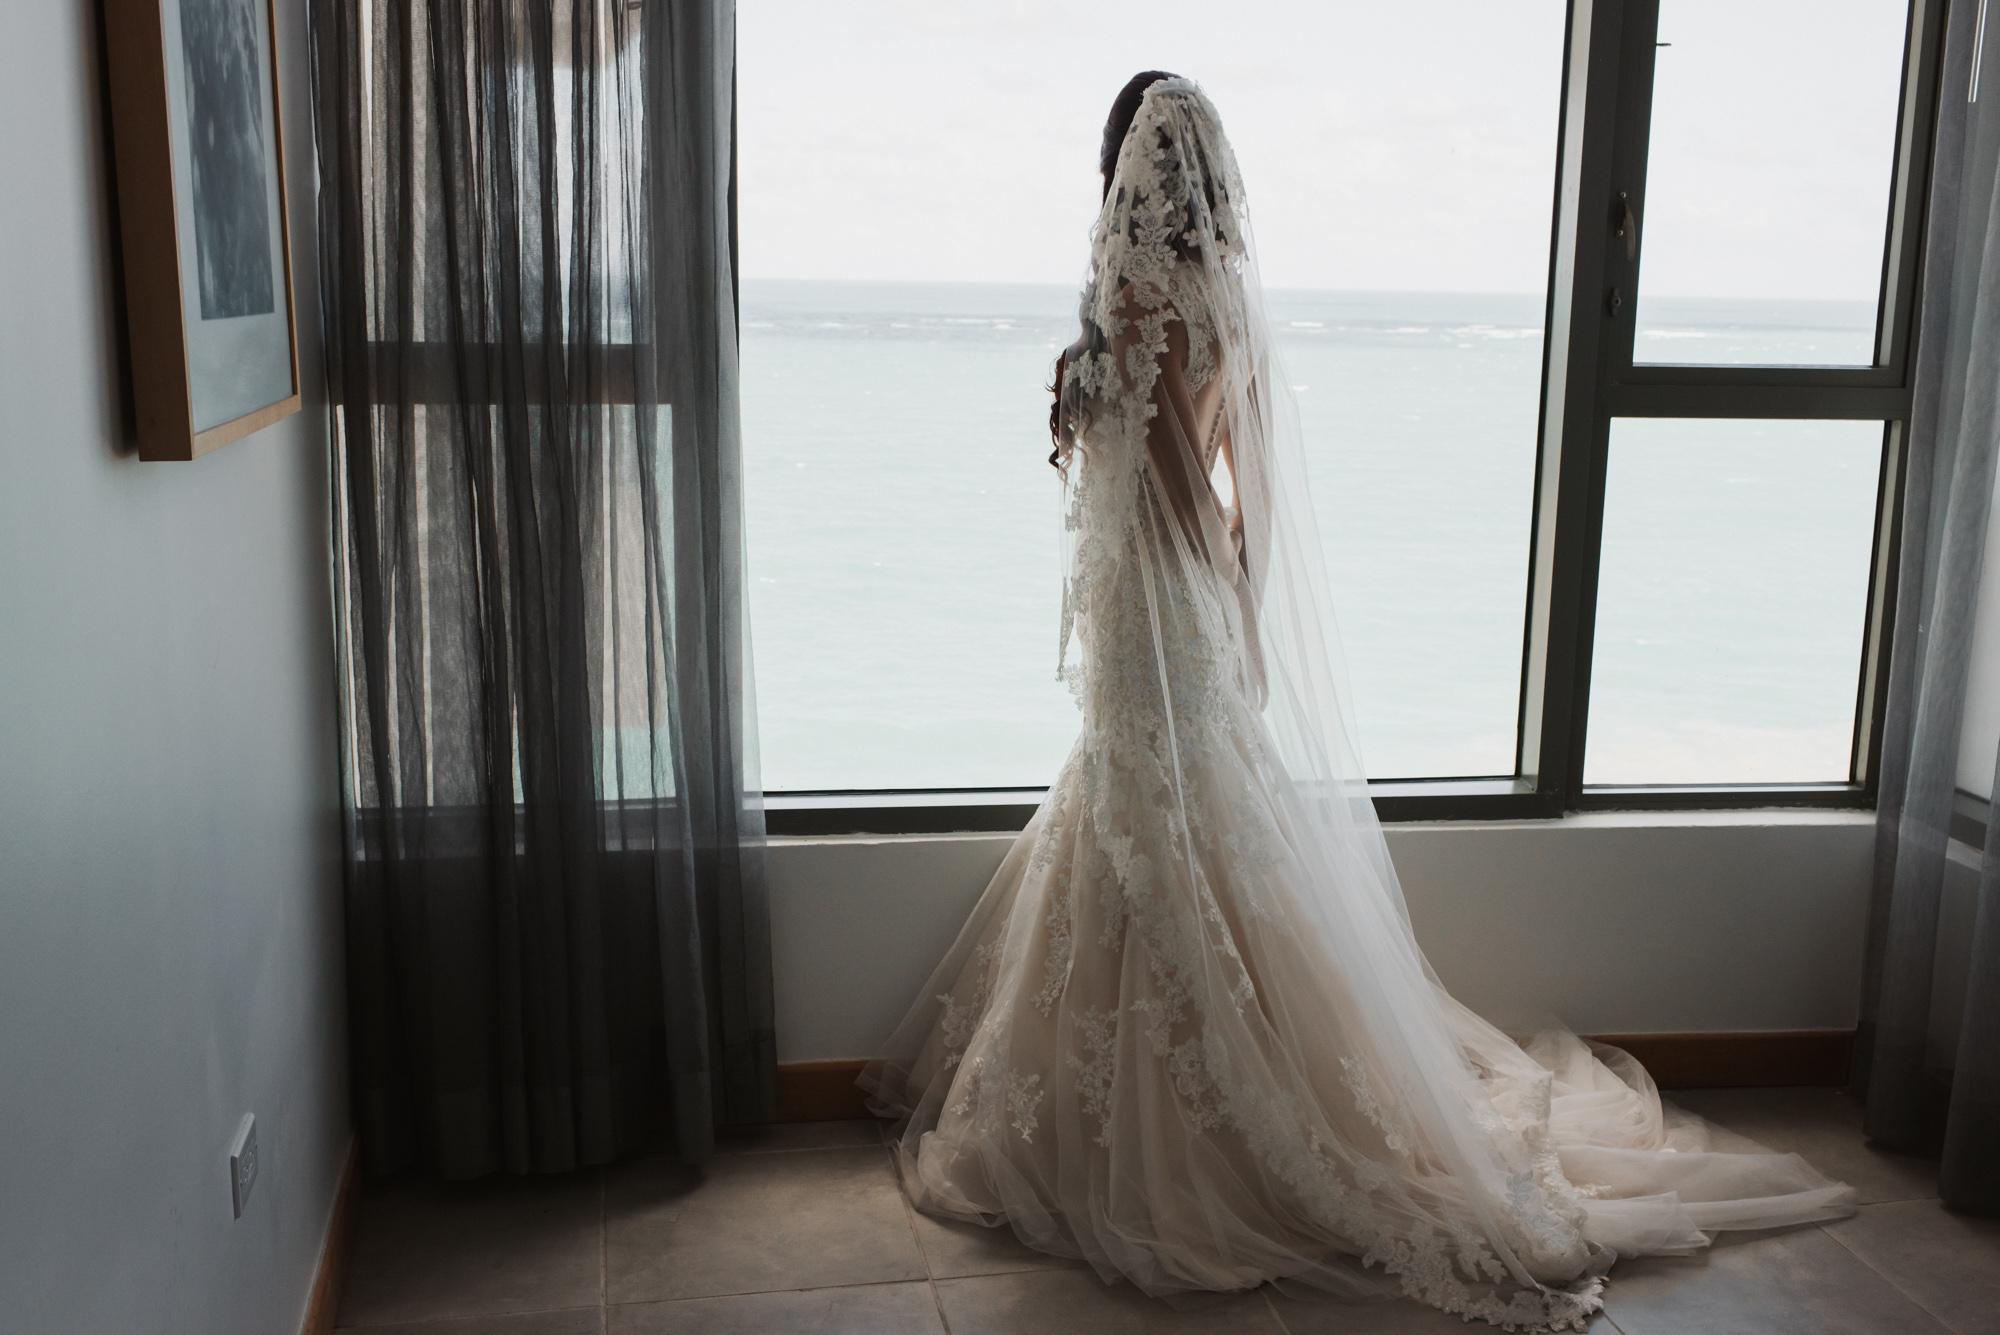 Puerto Rico Wedding Photography Destination Photographer Boris Zaretsky San Juan PR Casino Antiguo La Concha _ALI2311.jpg